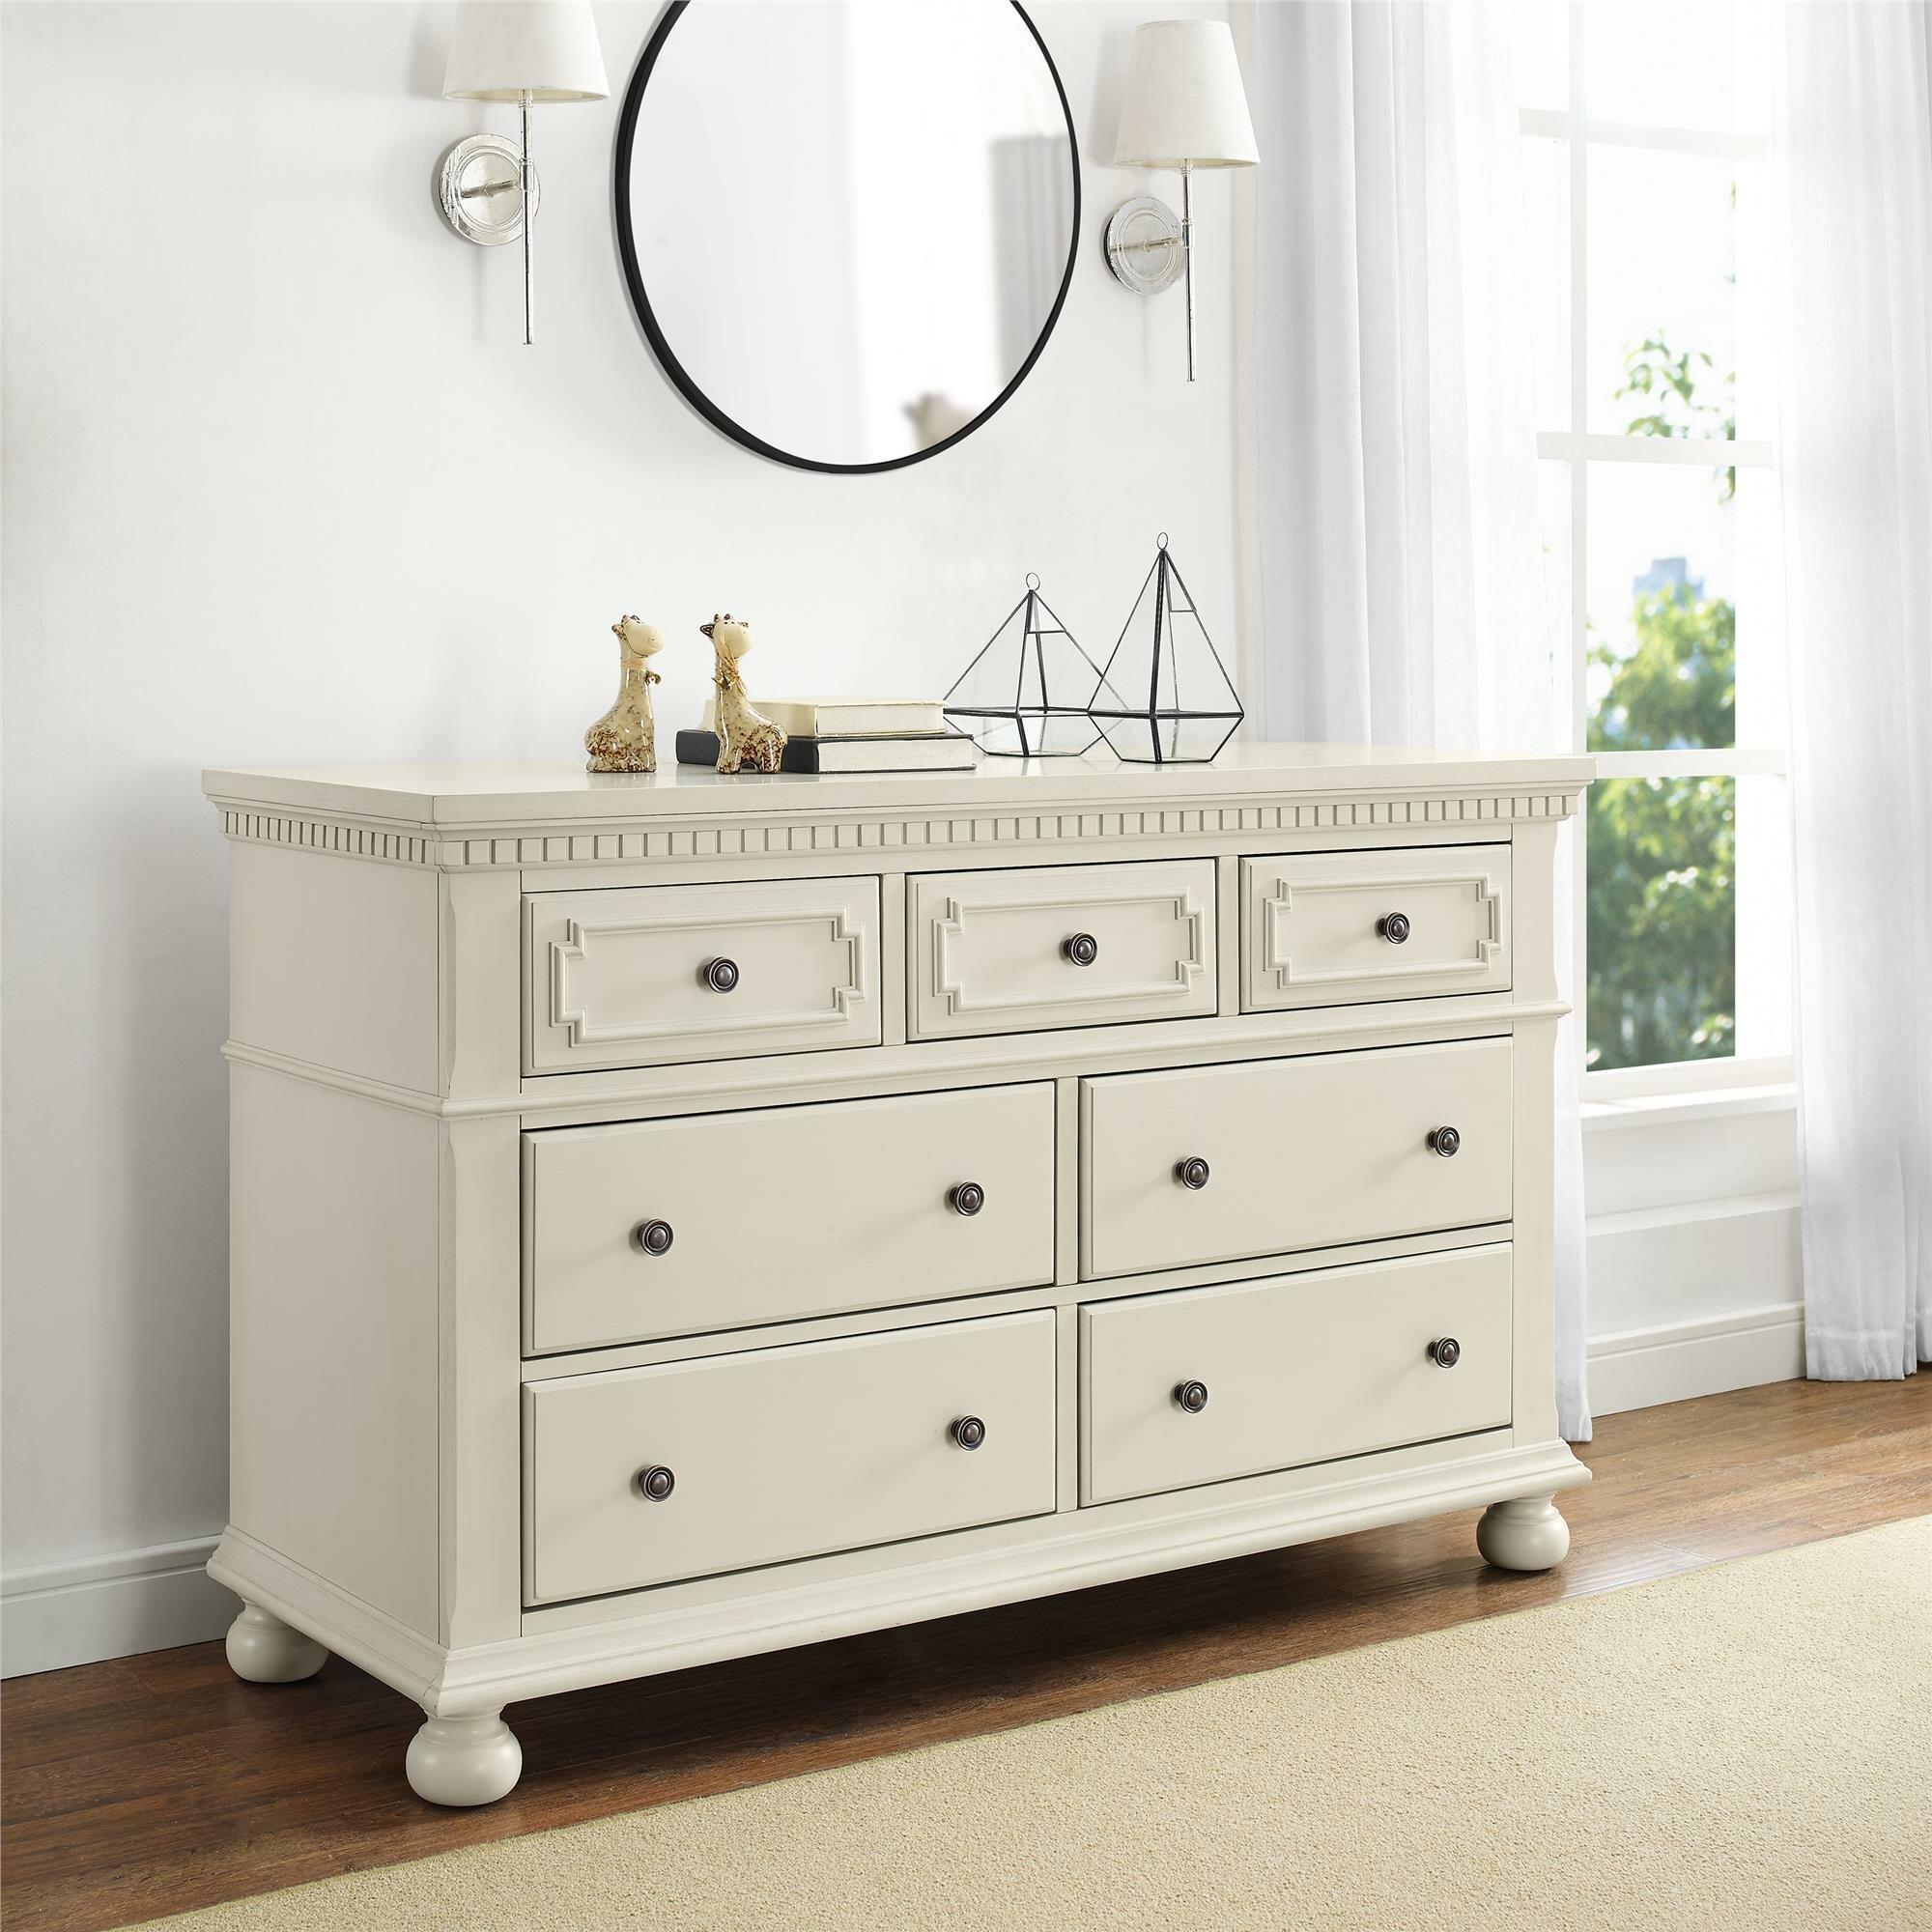 Vernay 7 Drawer Double Dresser